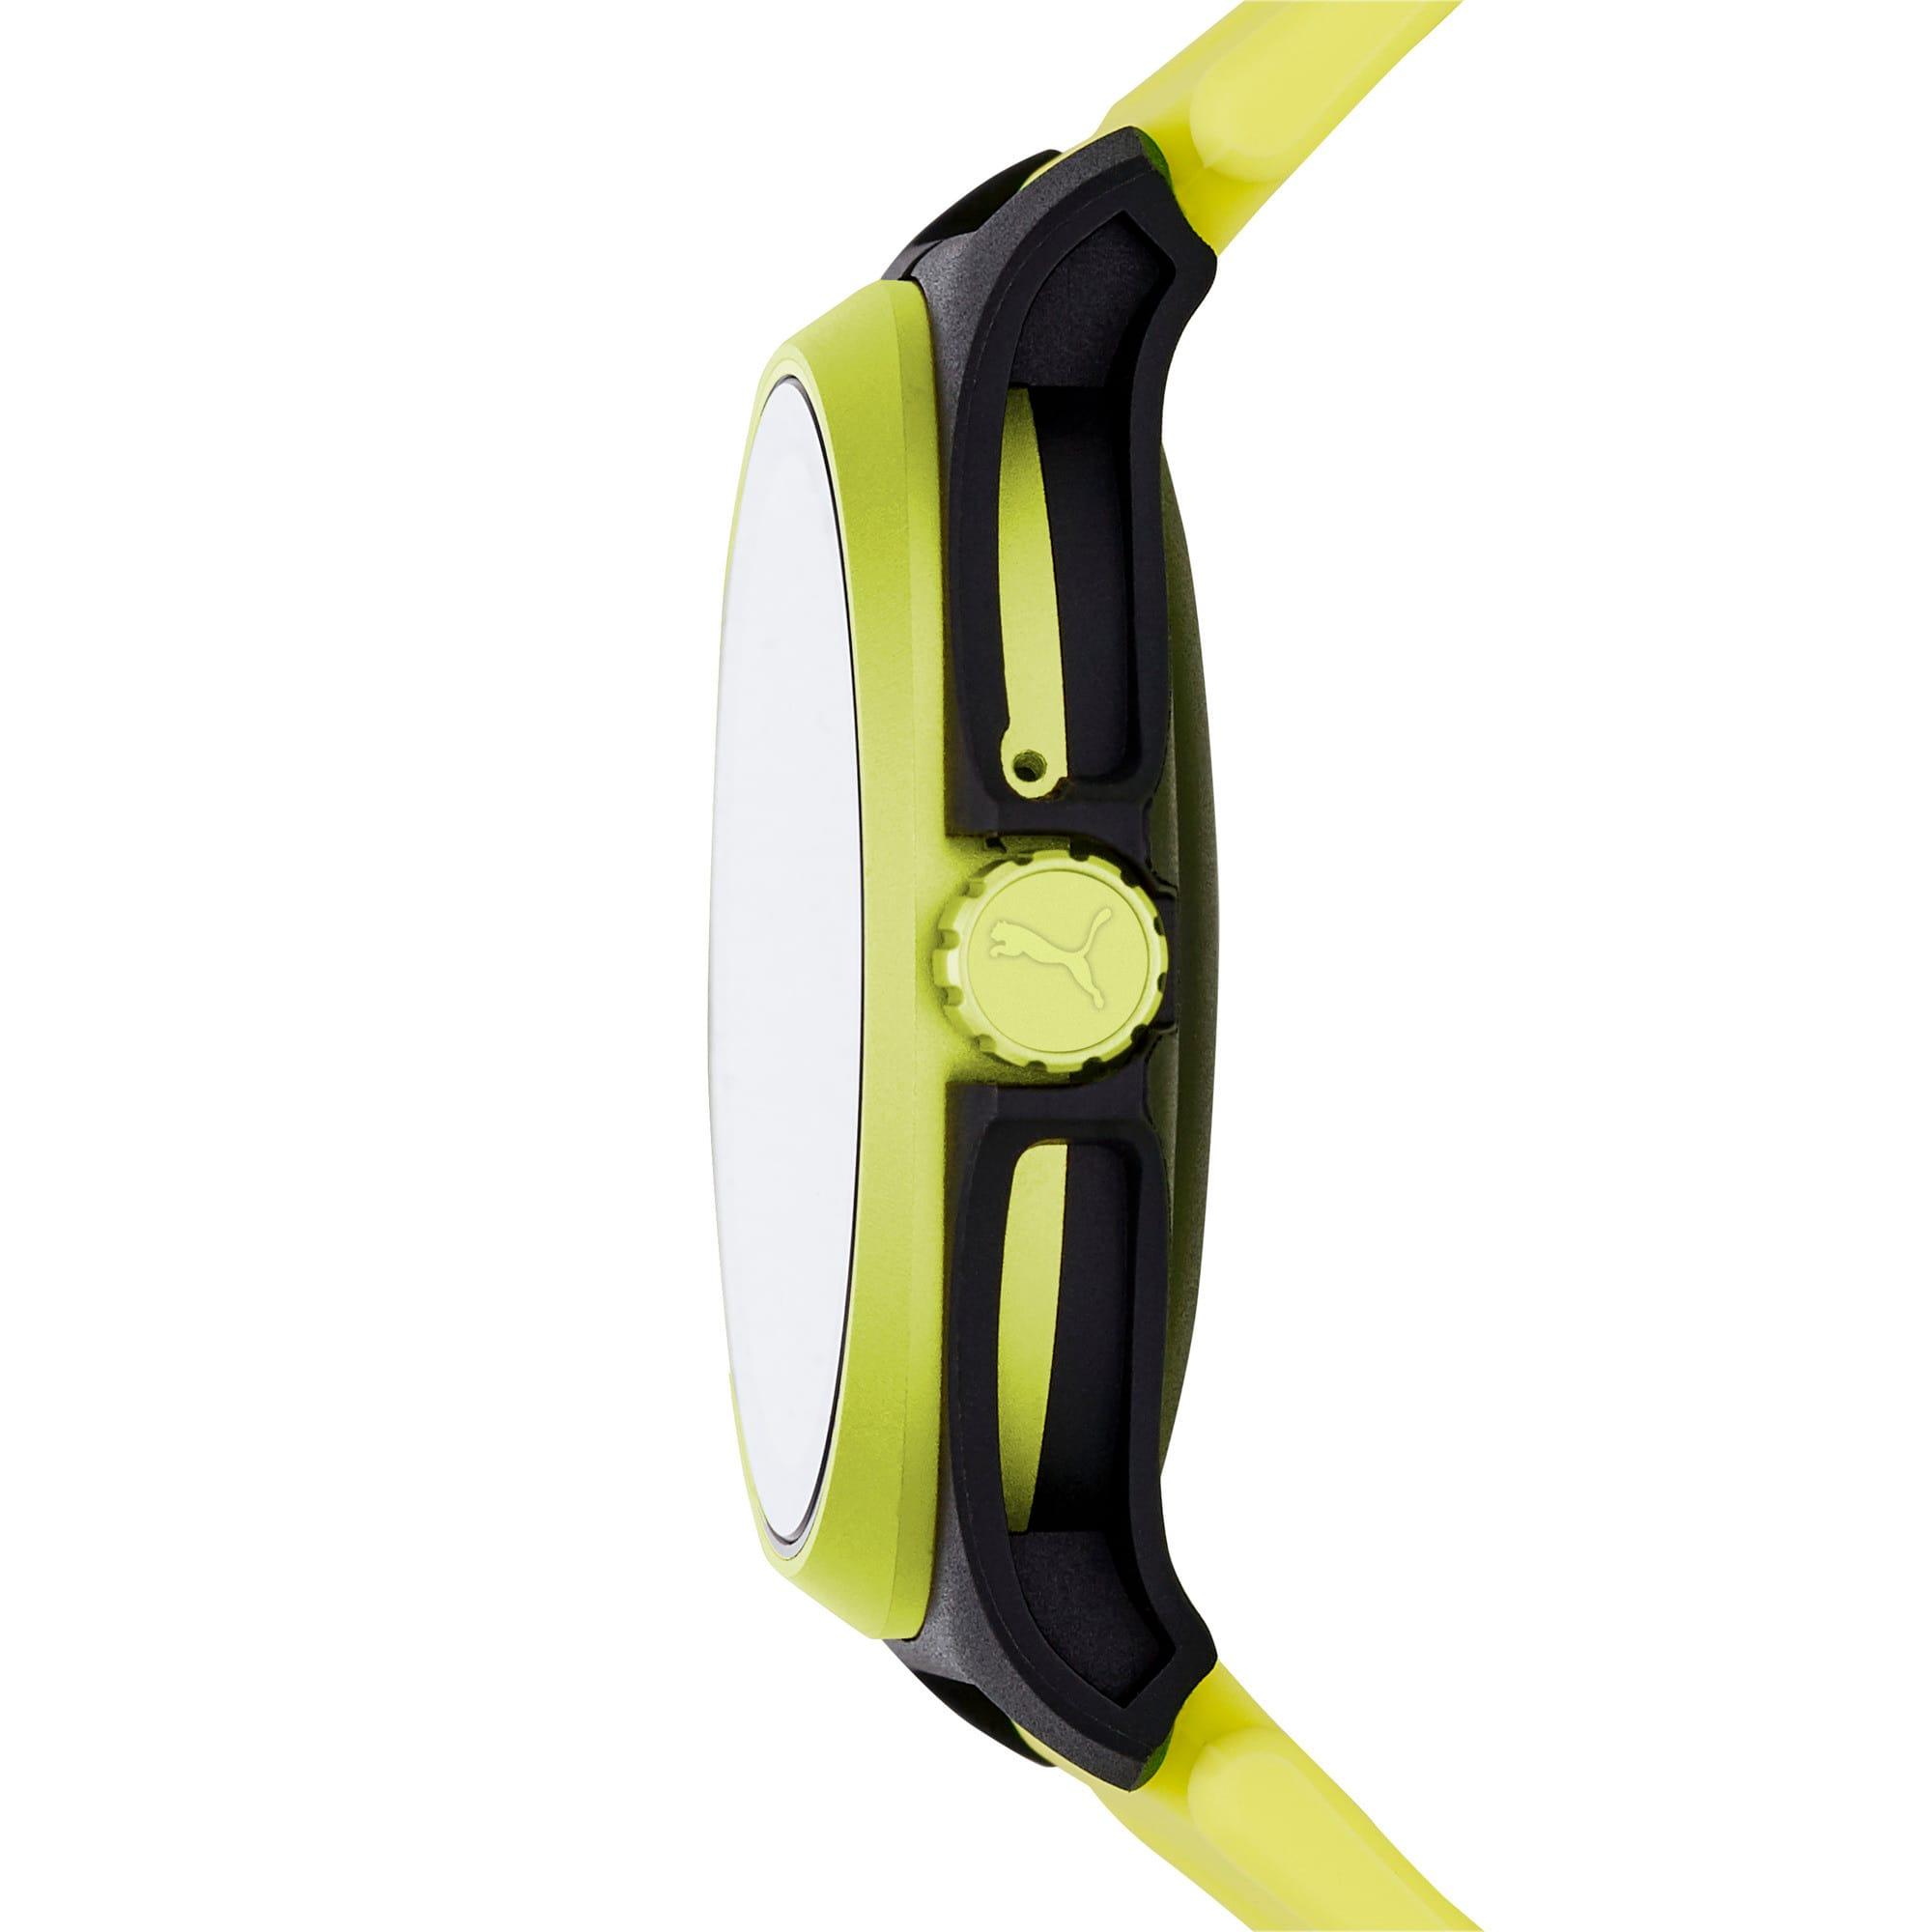 Thumbnail 4 of PUMA Smartwatch, Yellow/Black, medium